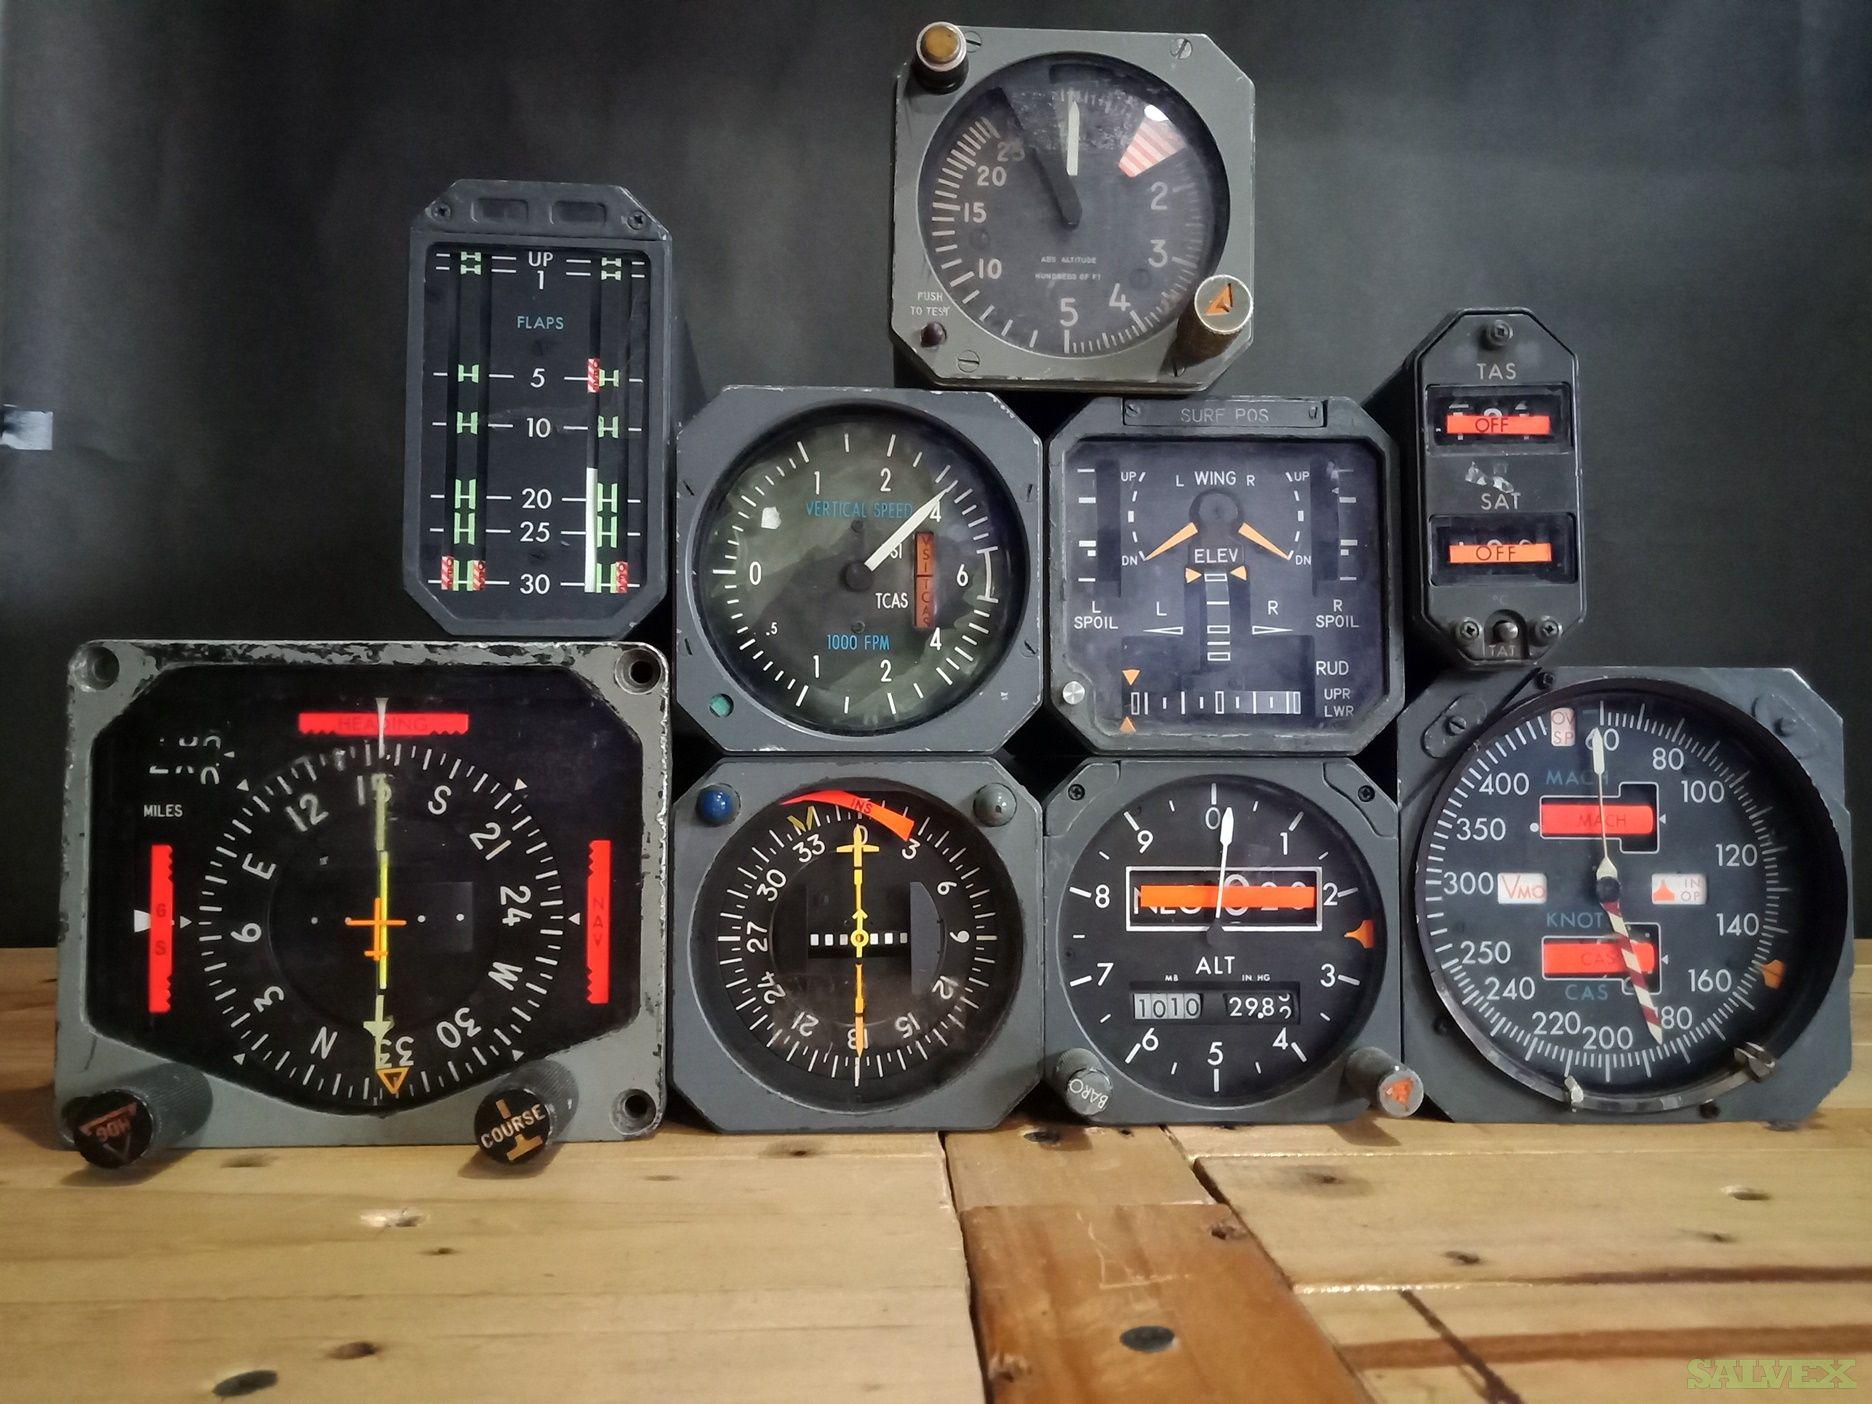 DC10 Altitude, Course, PDI Indicators and More (8 Units)